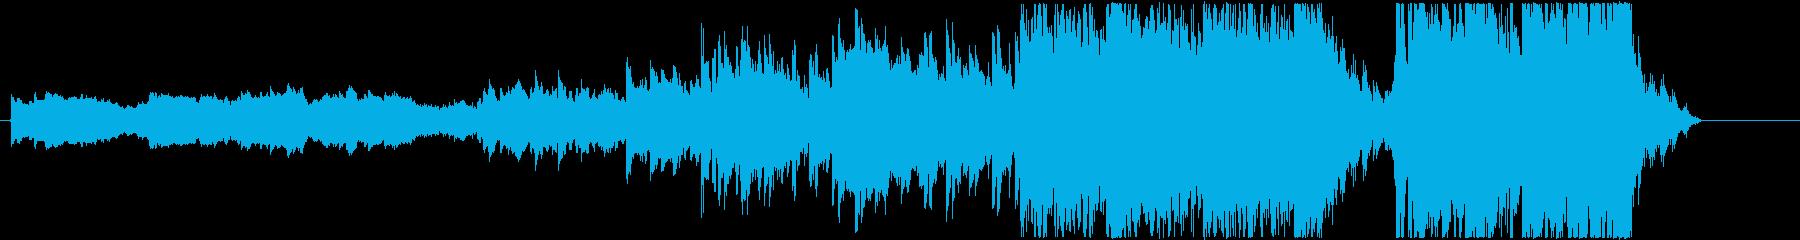 T.V.コンテンポラリーディスカバ...の再生済みの波形